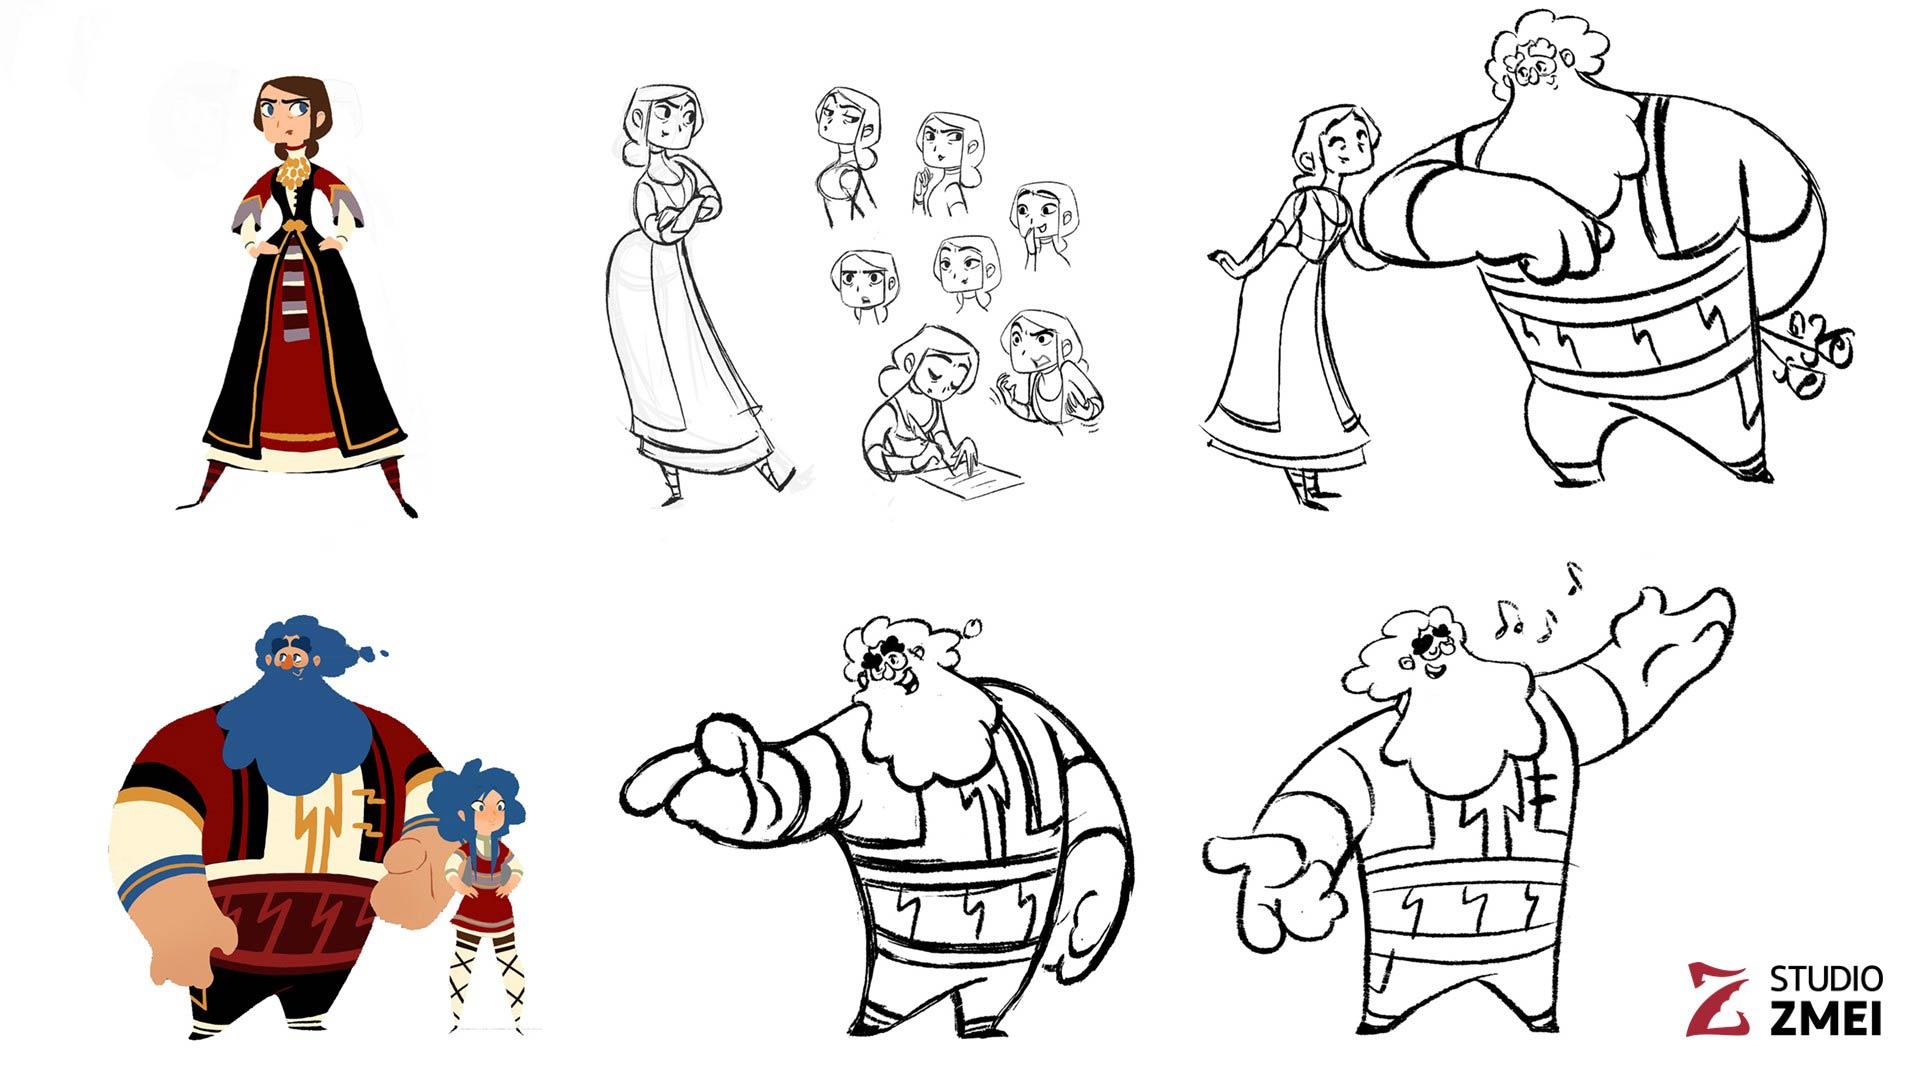 Character Design 07 - The Golden Apple